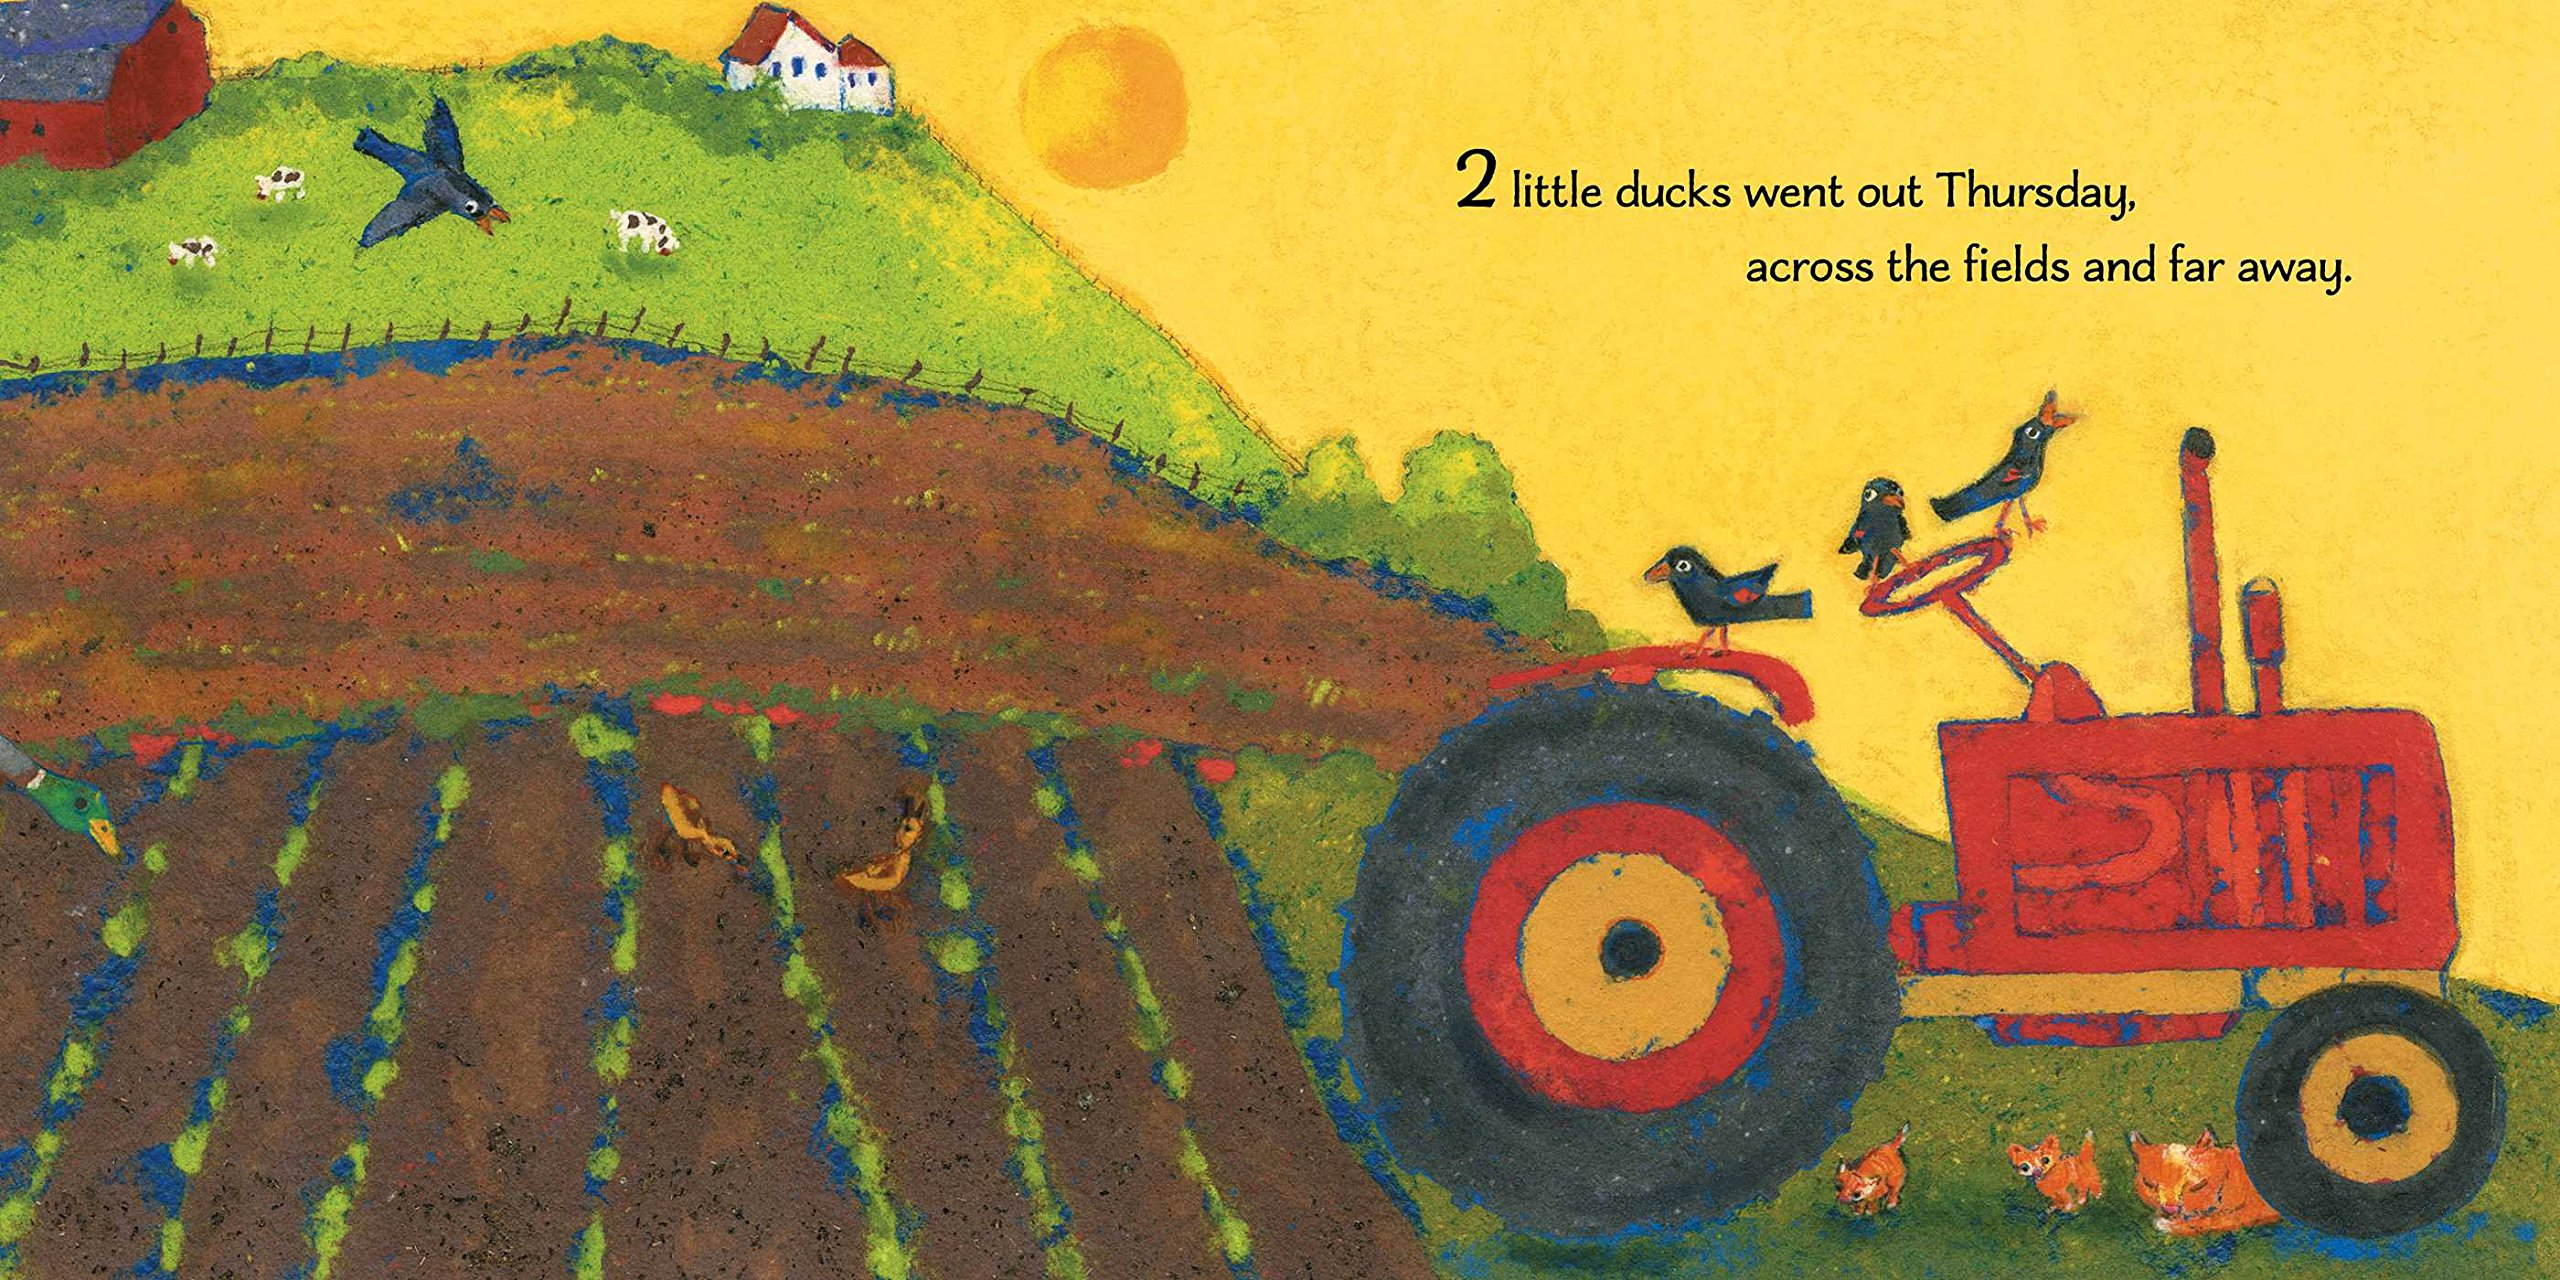 5 Little Ducks by Beach Lane Books (Image #5)